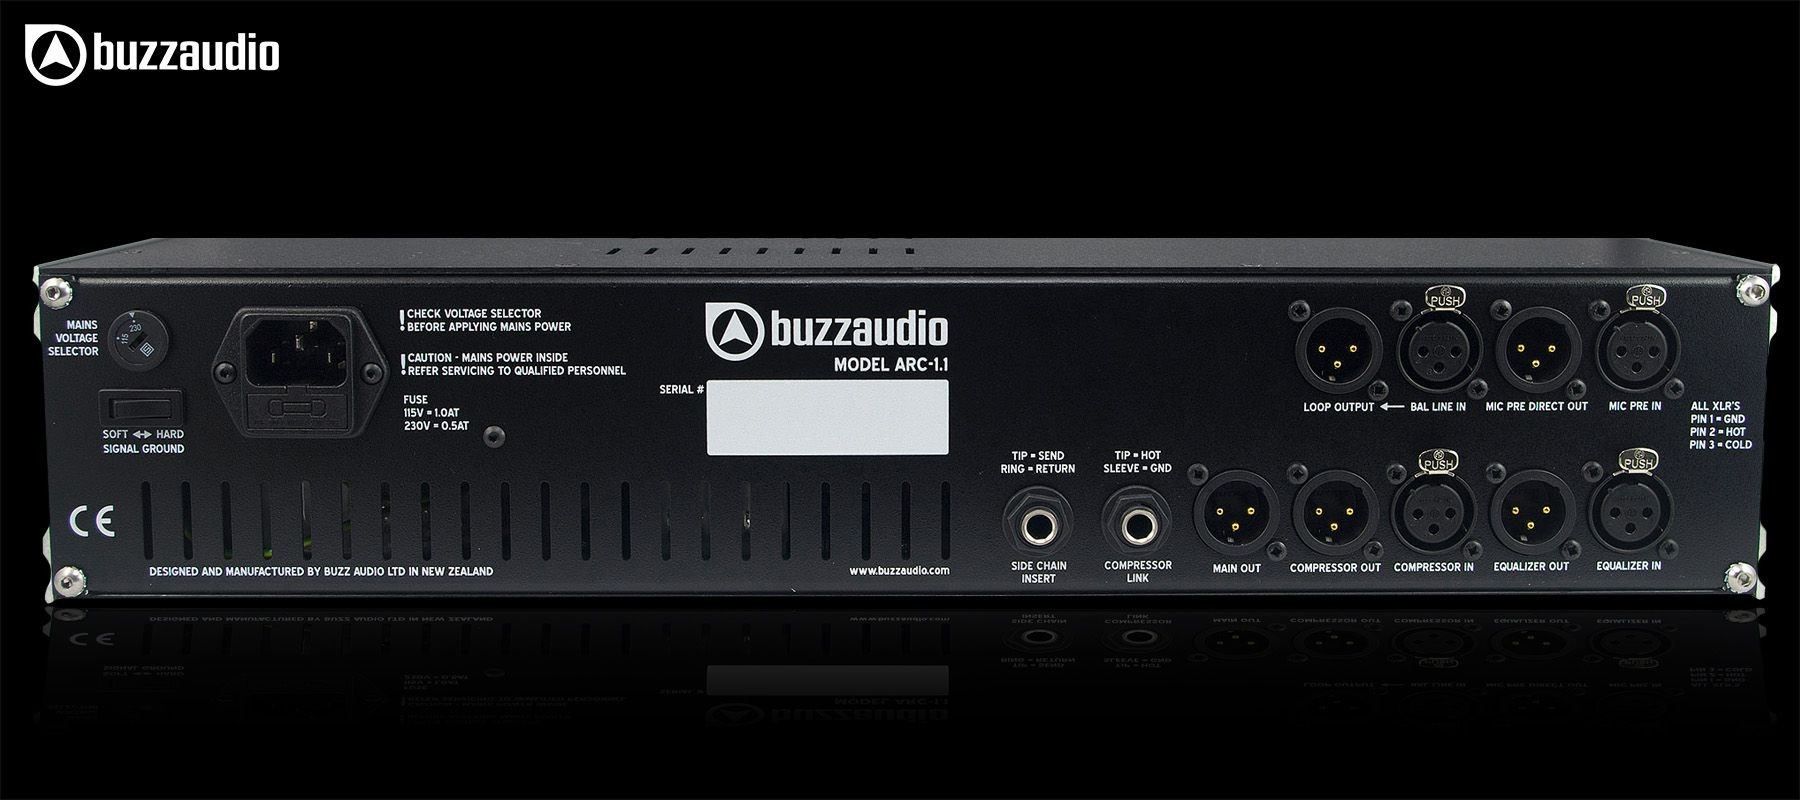 Buzz Audio ARC-1.1 - Back